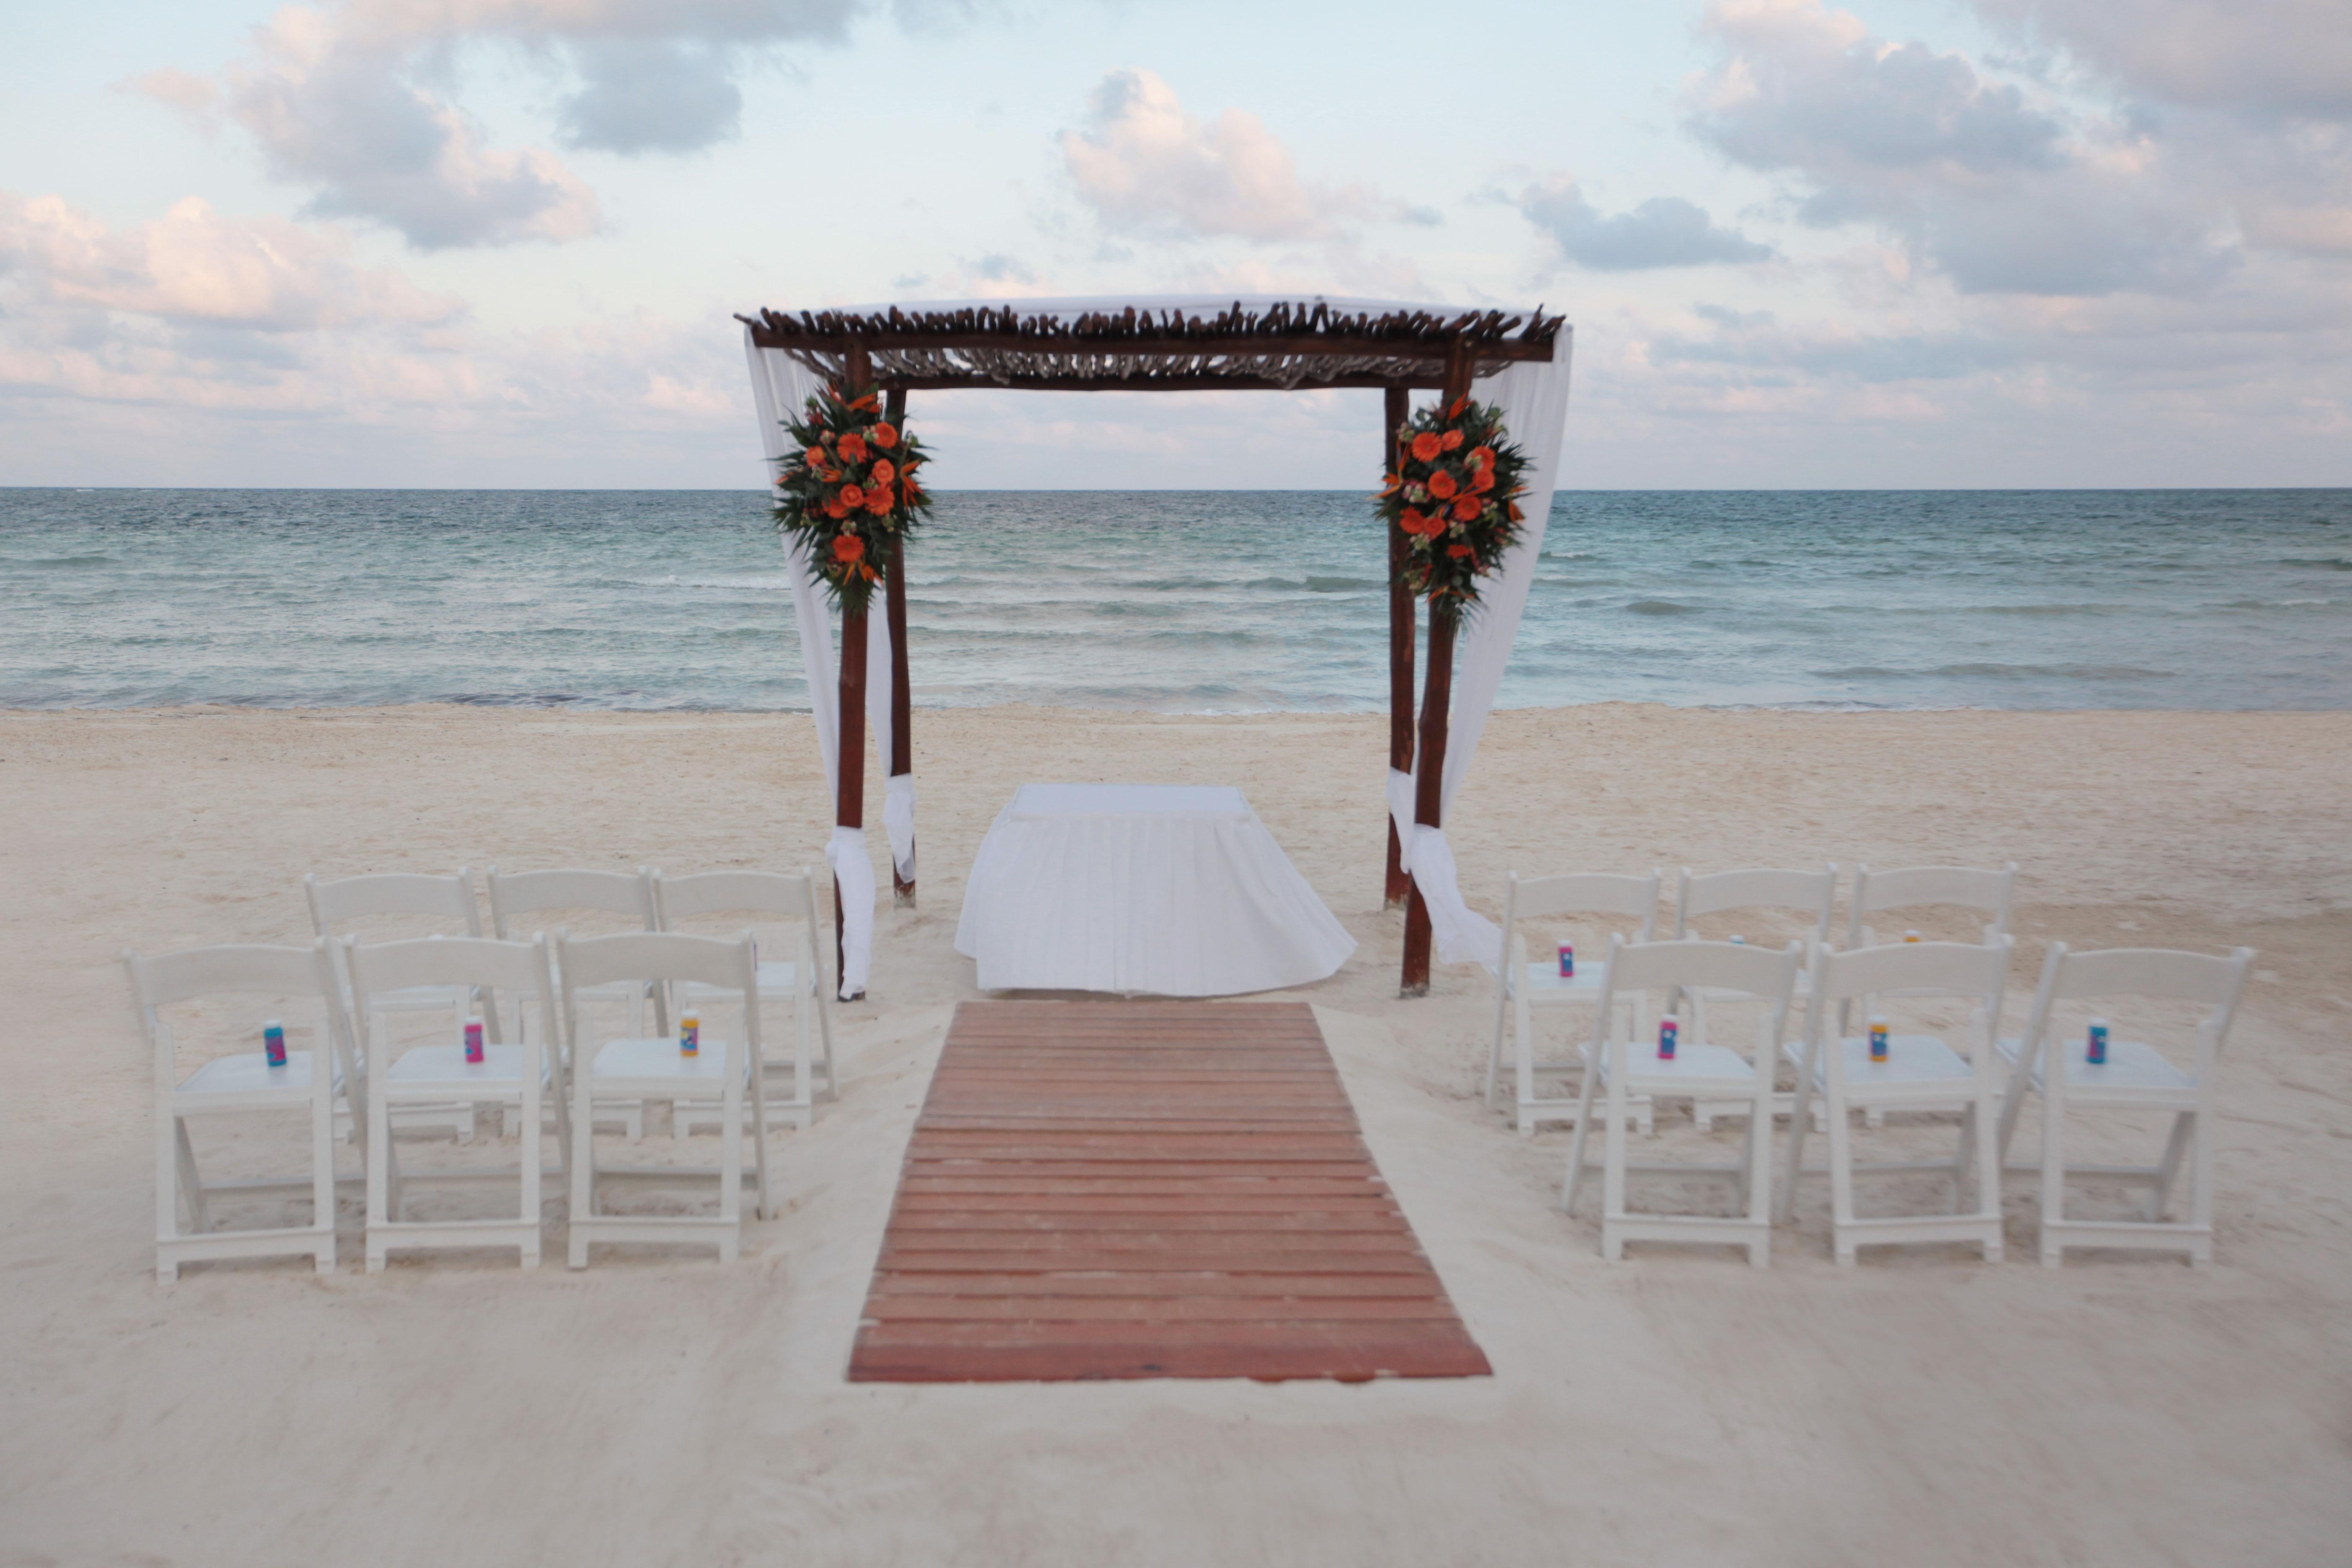 Gazebo-on-the-beach-few-guests